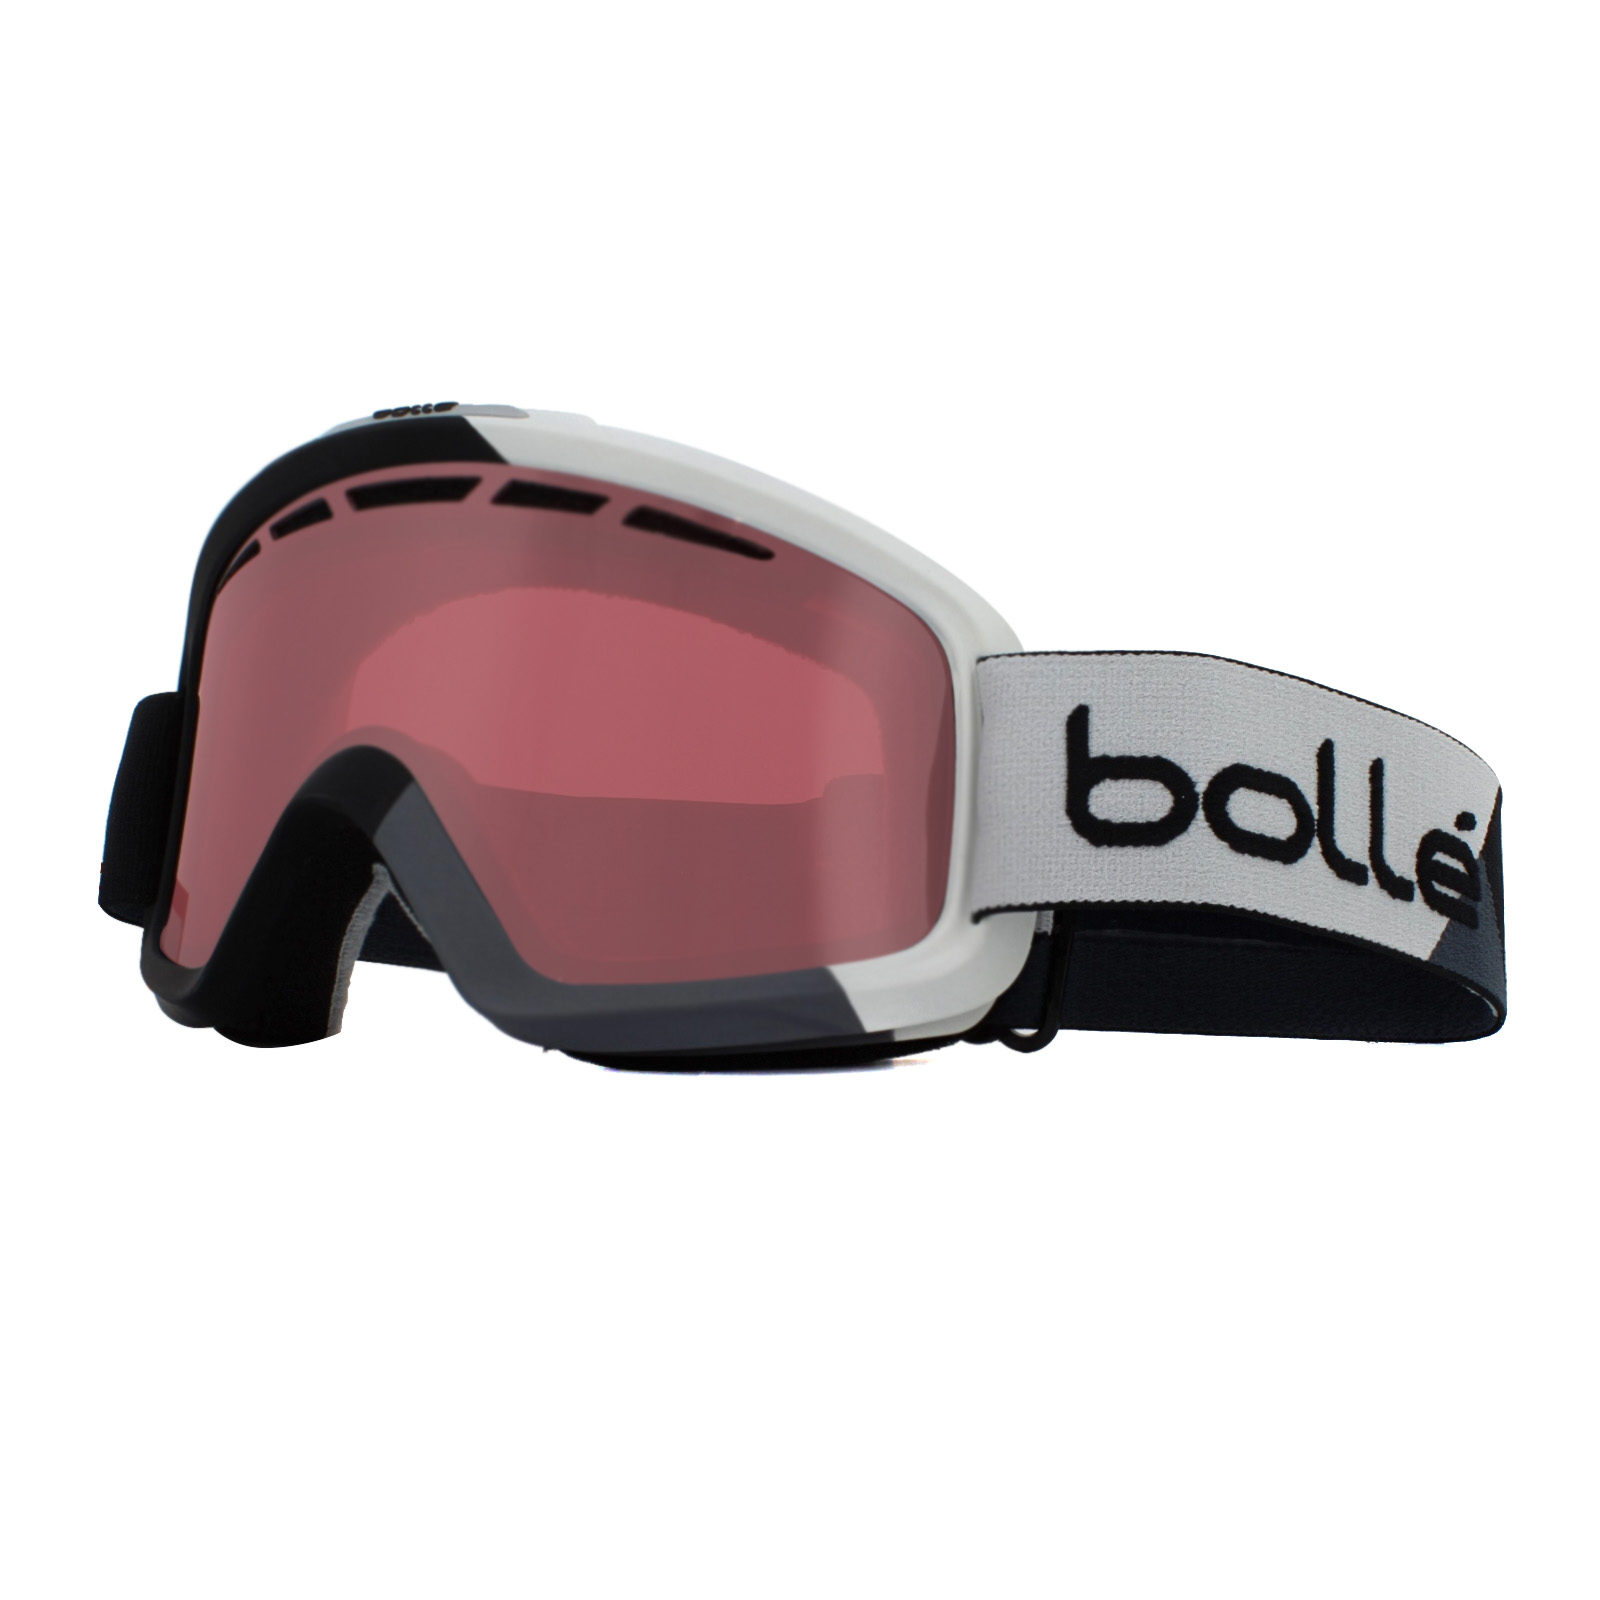 017d7fbb85 Sentinel Bolle Ski Goggles Nova II 21472 Matt Black   Grey Vermillon Gun